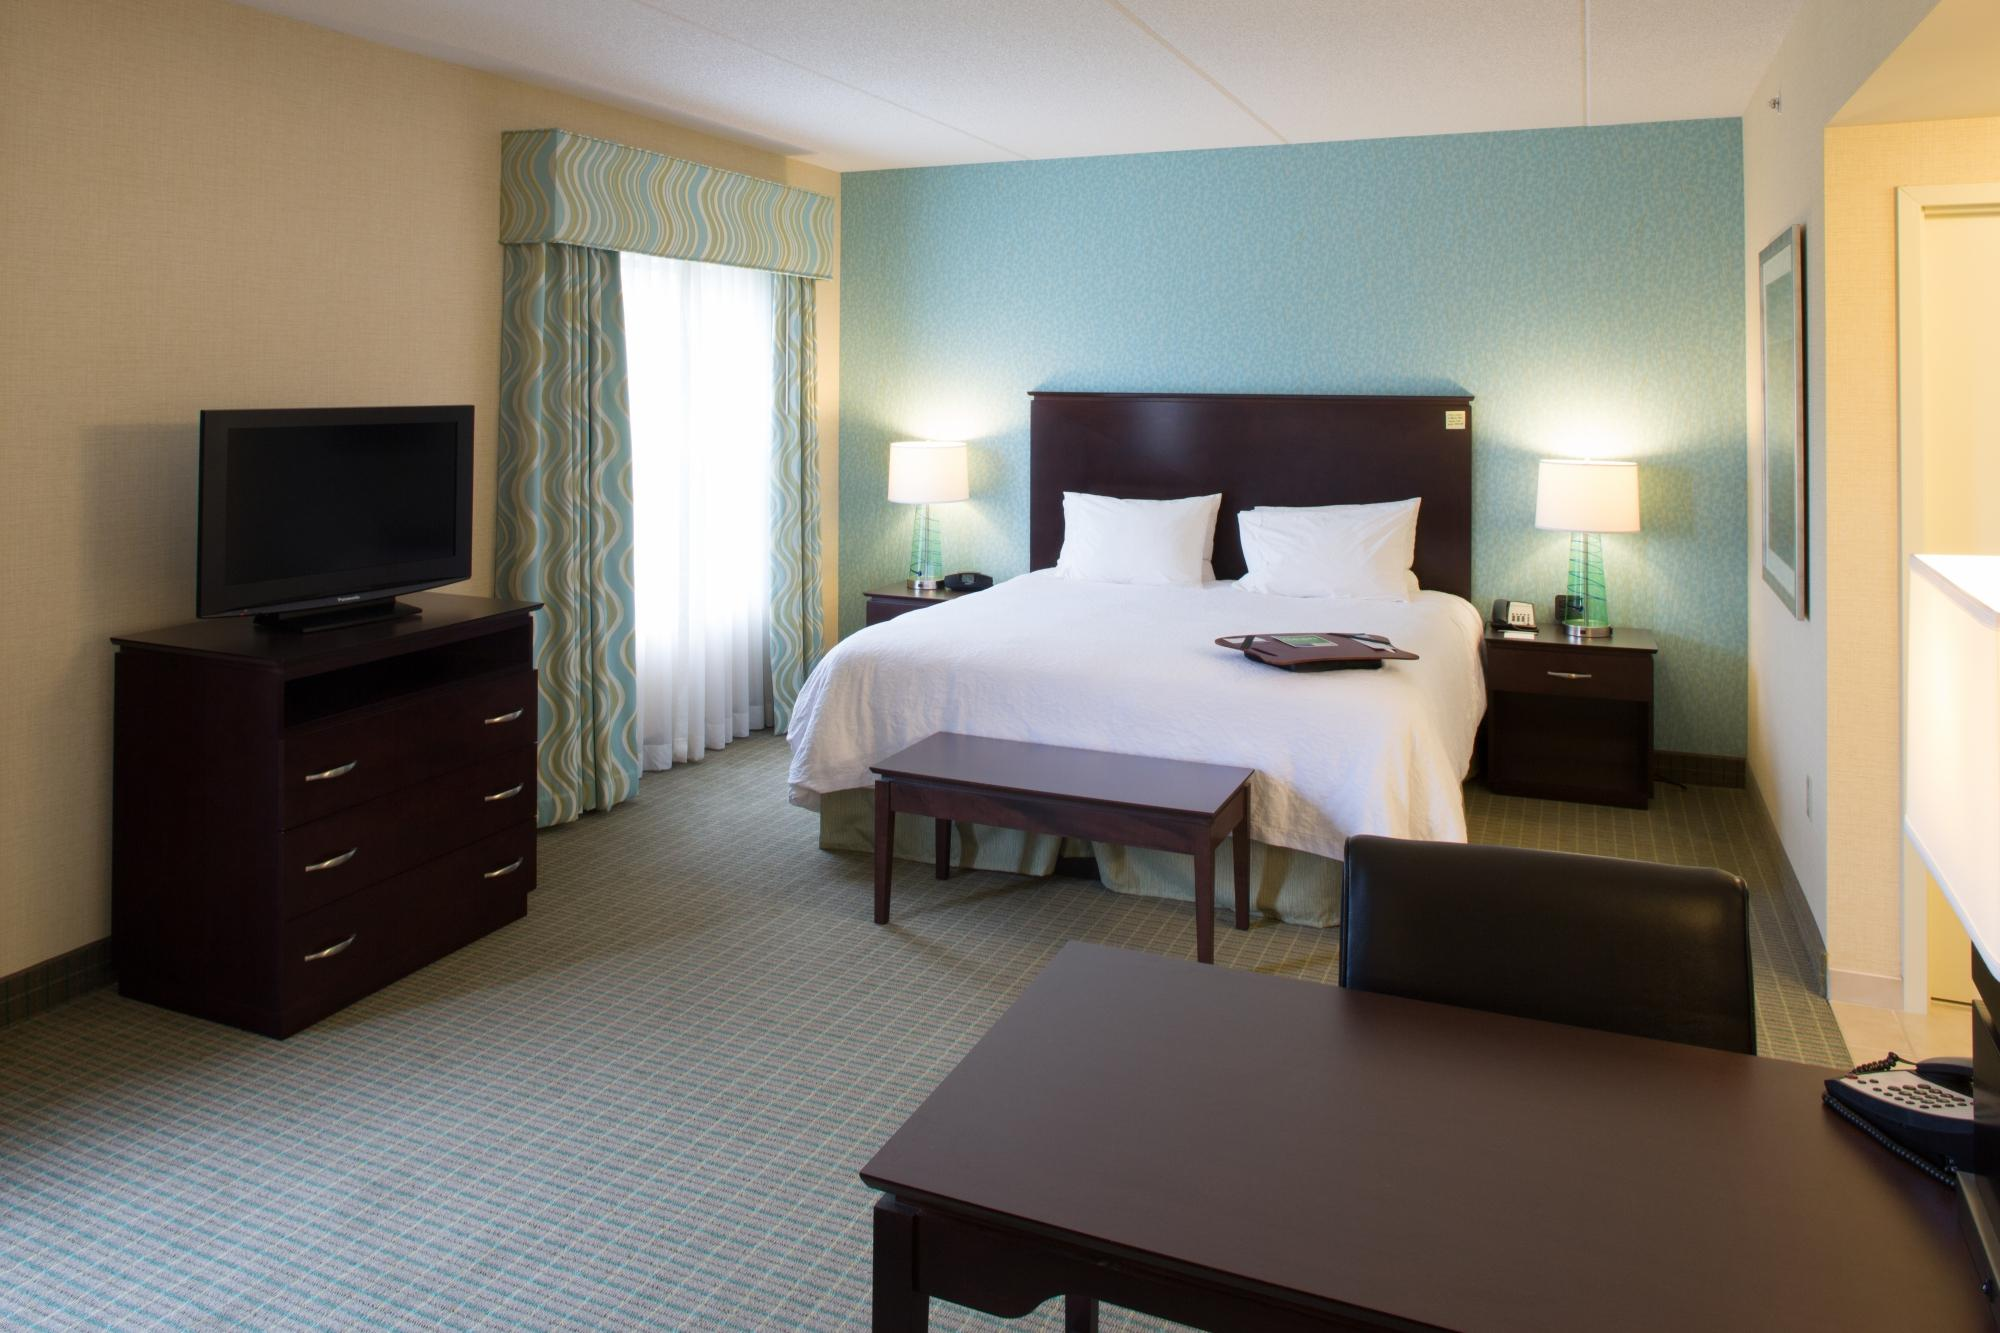 hampton inn suites wilkes barre pa 2018 hotel review ratings